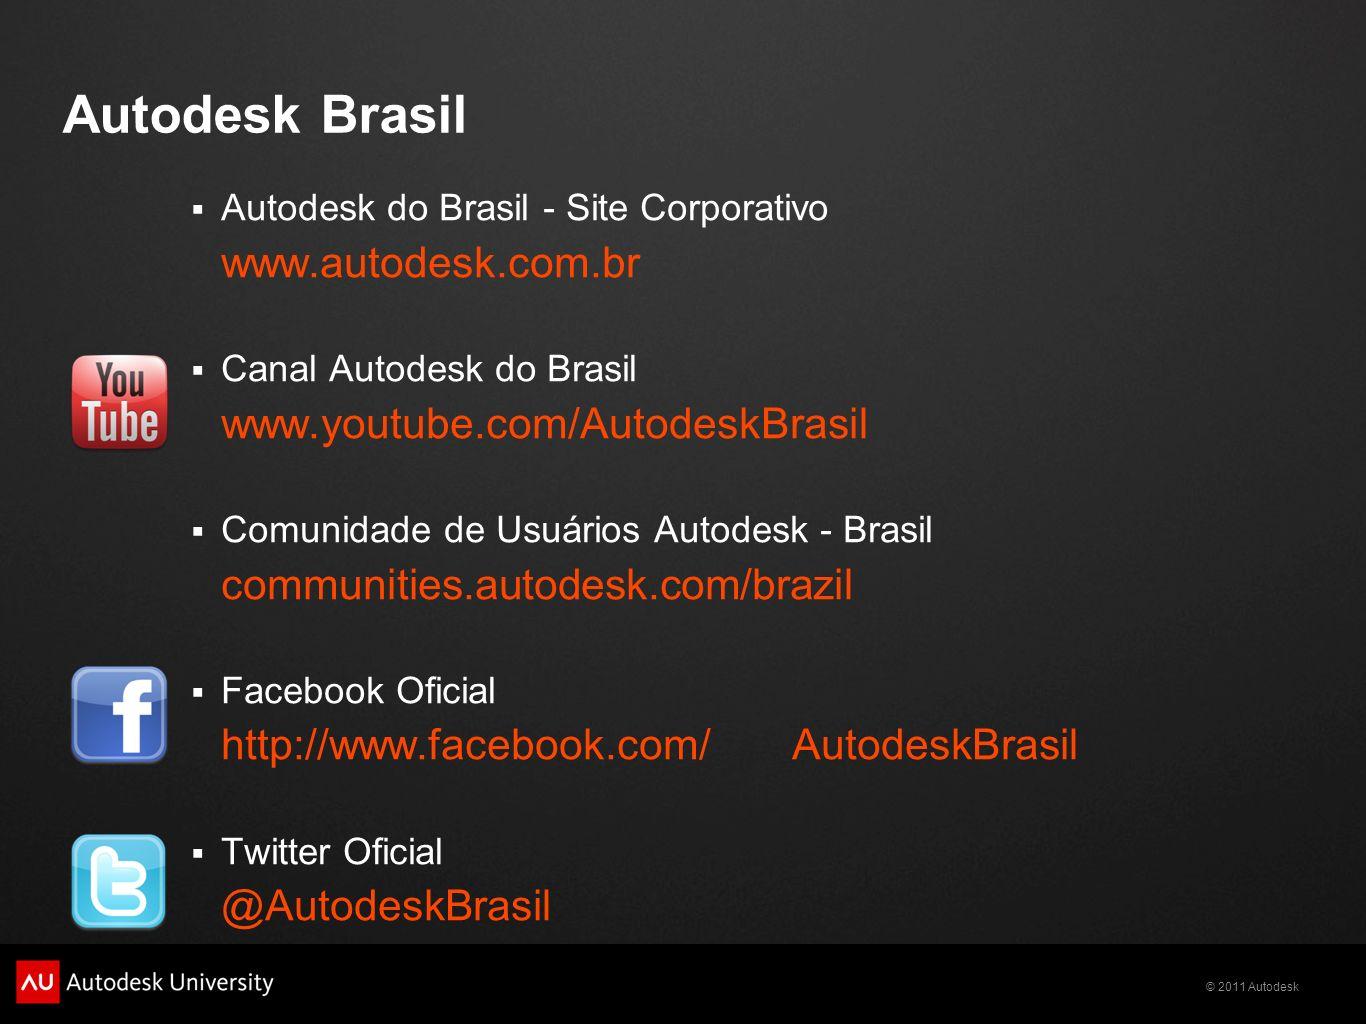 Autodesk Brasil Autodesk do Brasil - Site Corporativo www.autodesk.com.br Canal Autodesk do Brasil www.youtube.com/AutodeskBrasil Comunidade de Usuári